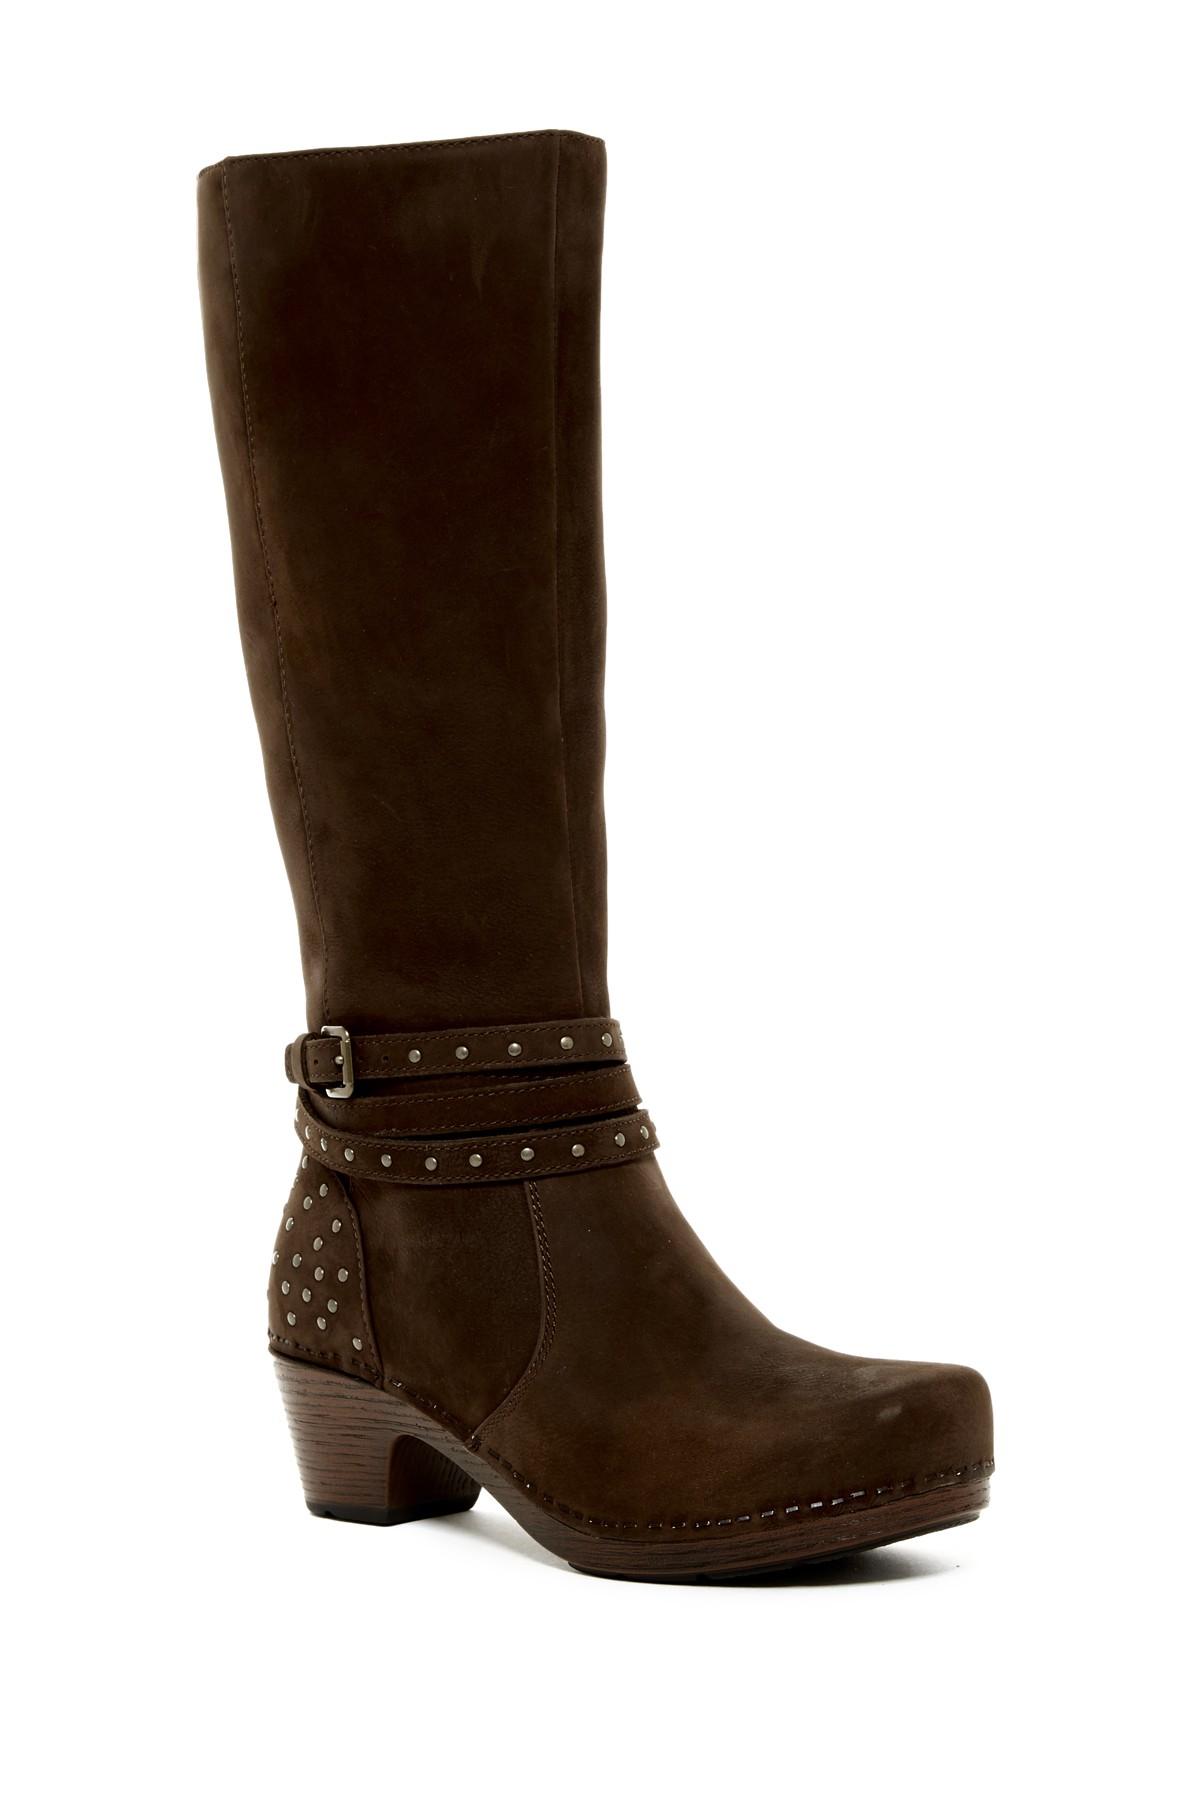 Dansko Myra Studded Tall Boot In Brown Lyst